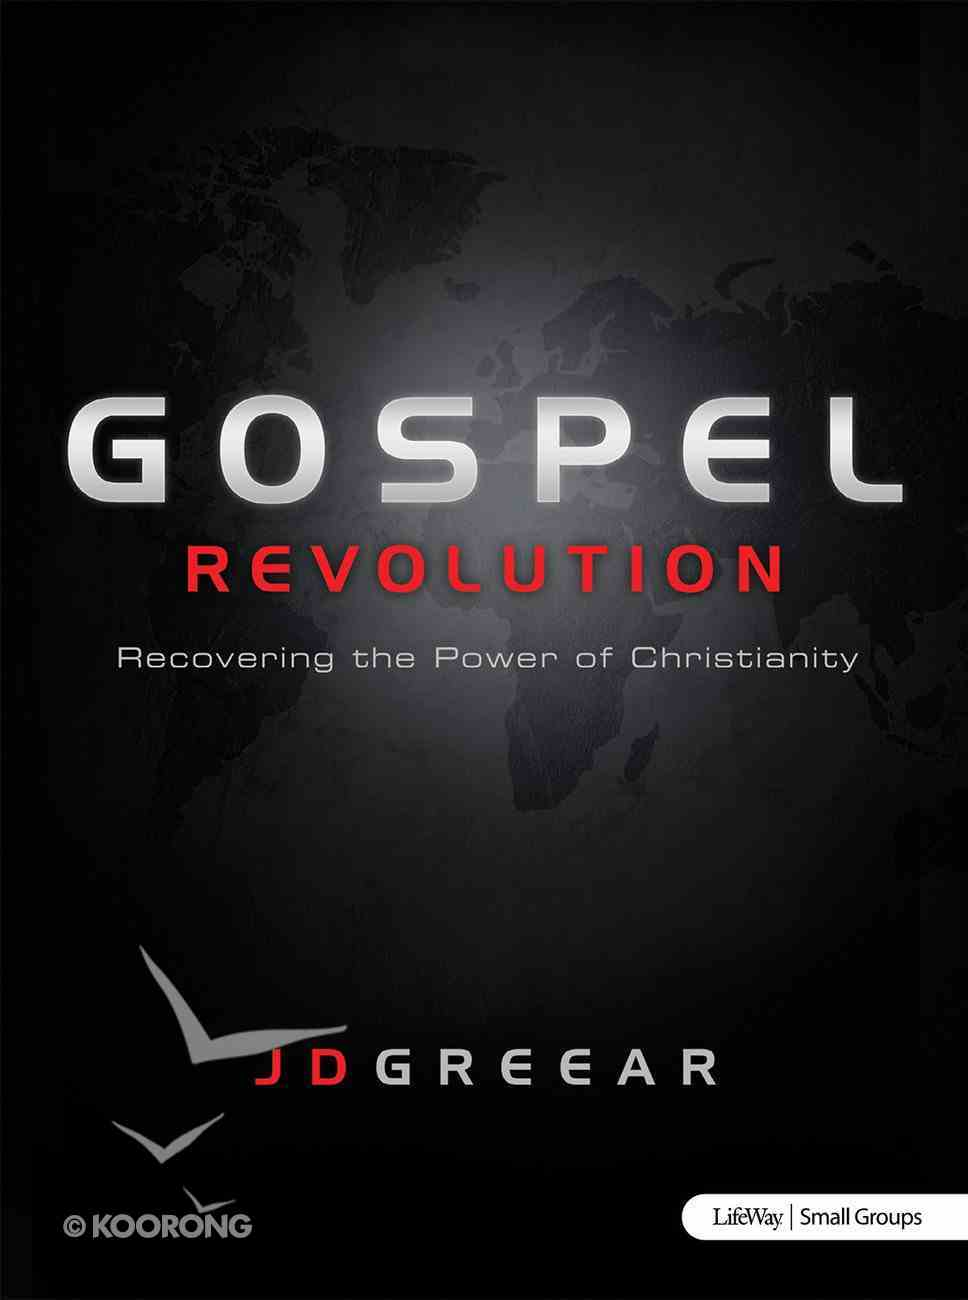 Gospel Revolution: Recovering the Power of Christianity eBook